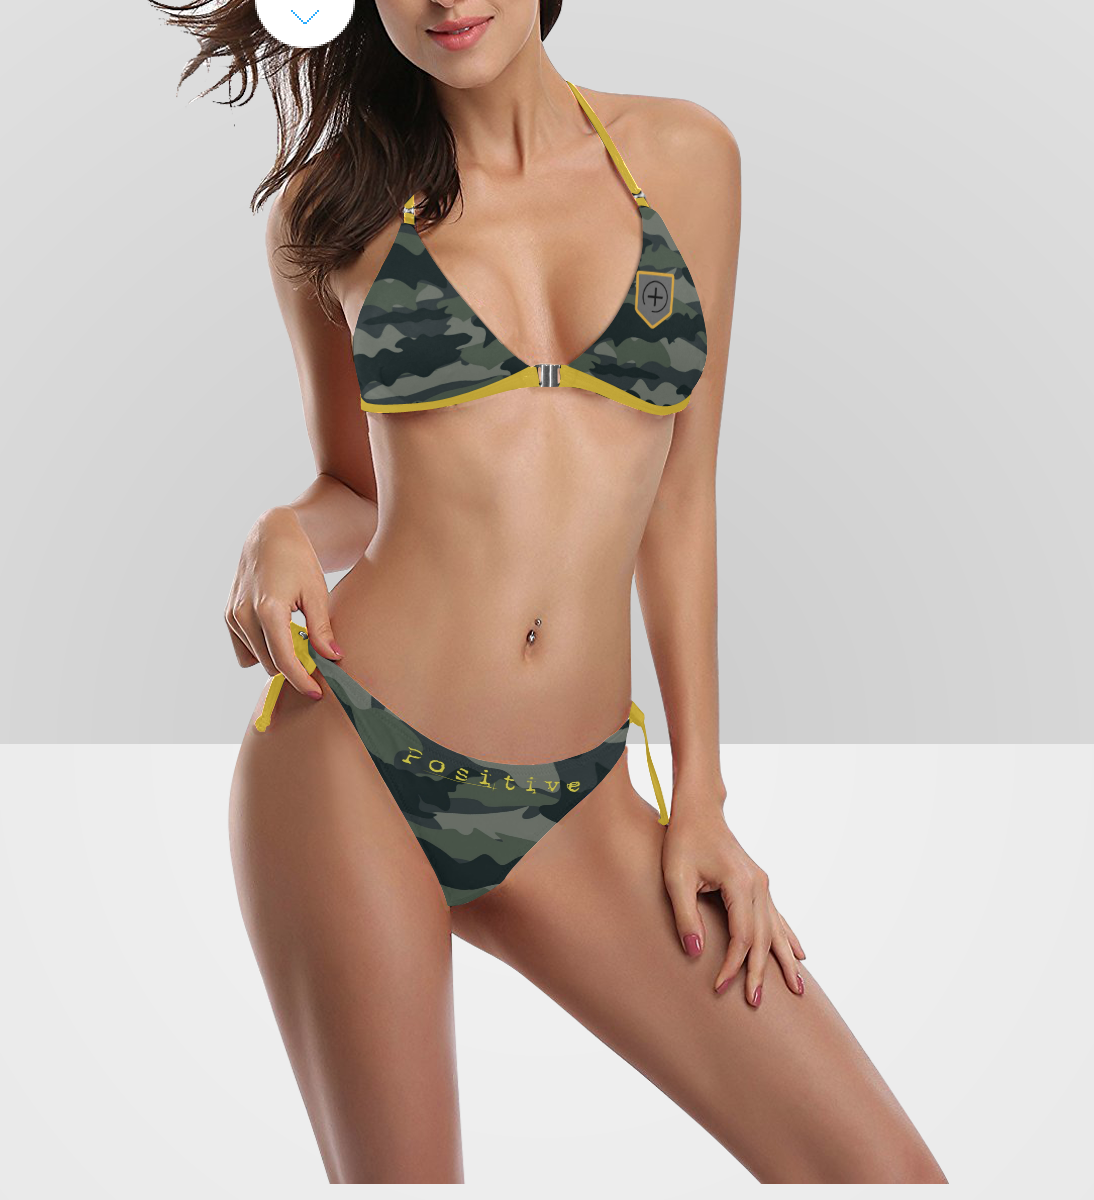 Outlet Bikini CAMOUFLAGE